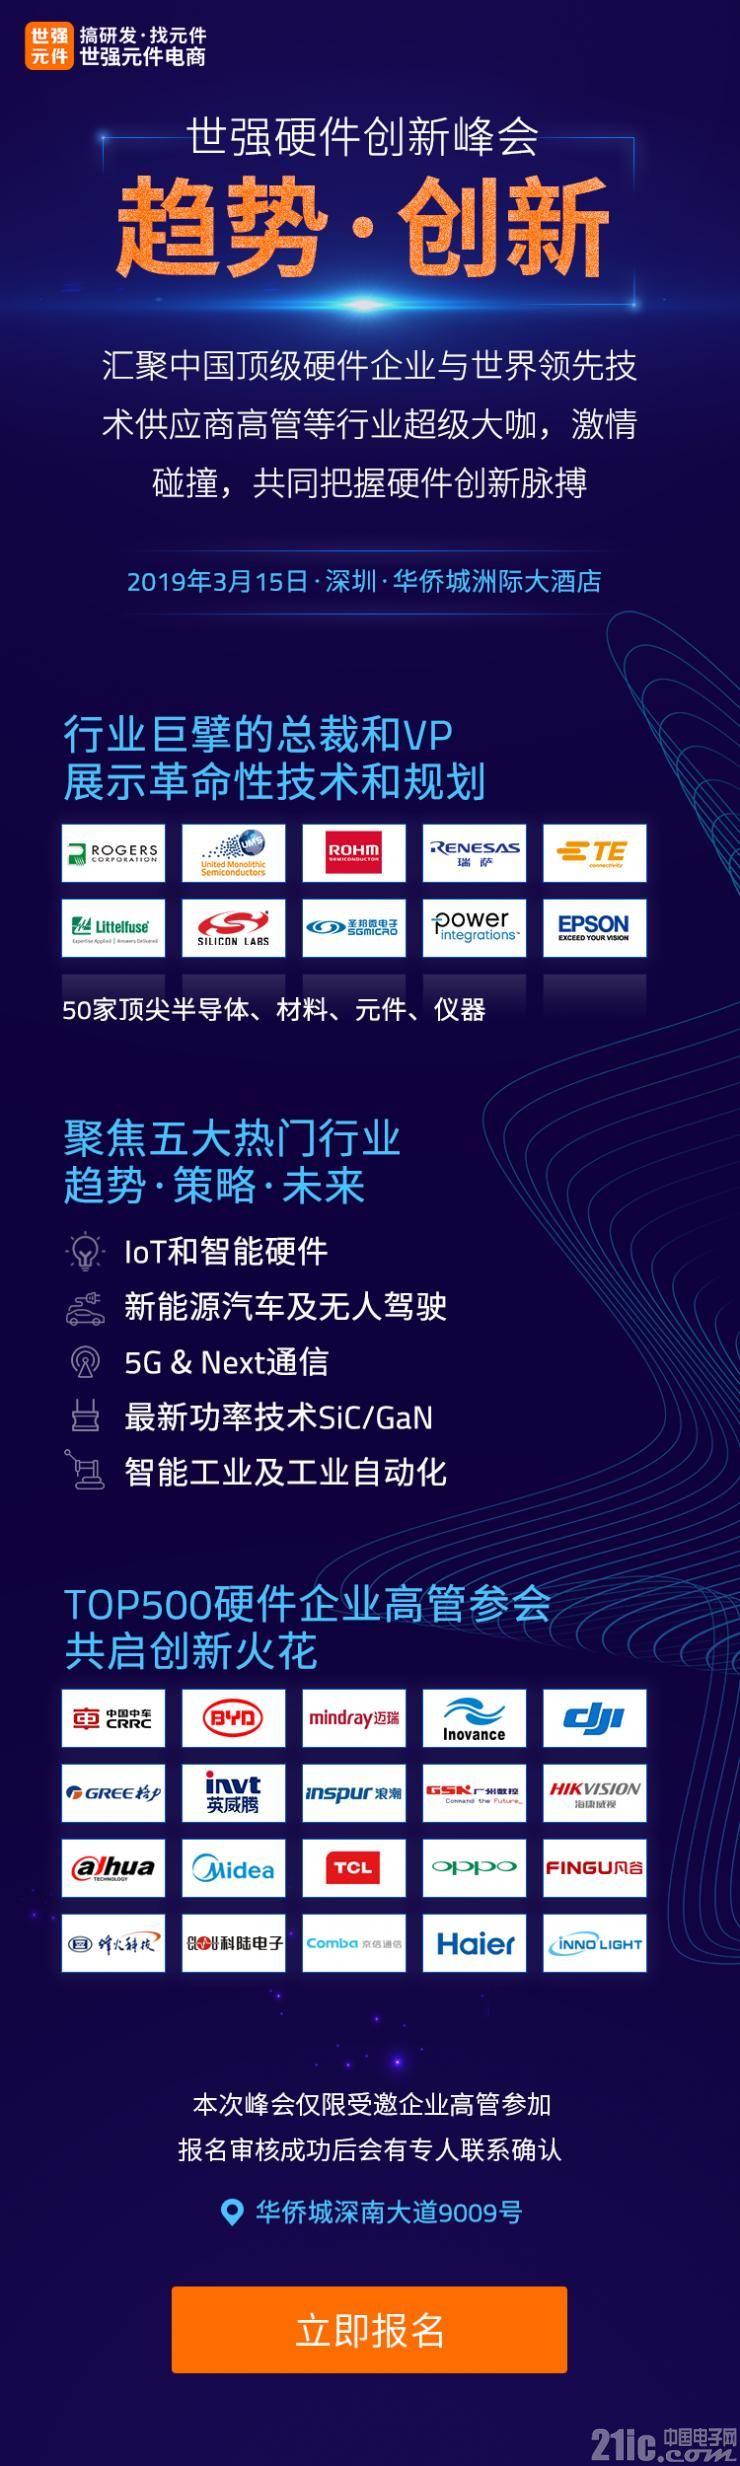 "Melexis将发布最新传感器汽车市场发展战略--2019""硬件创新峰会""前瞻"